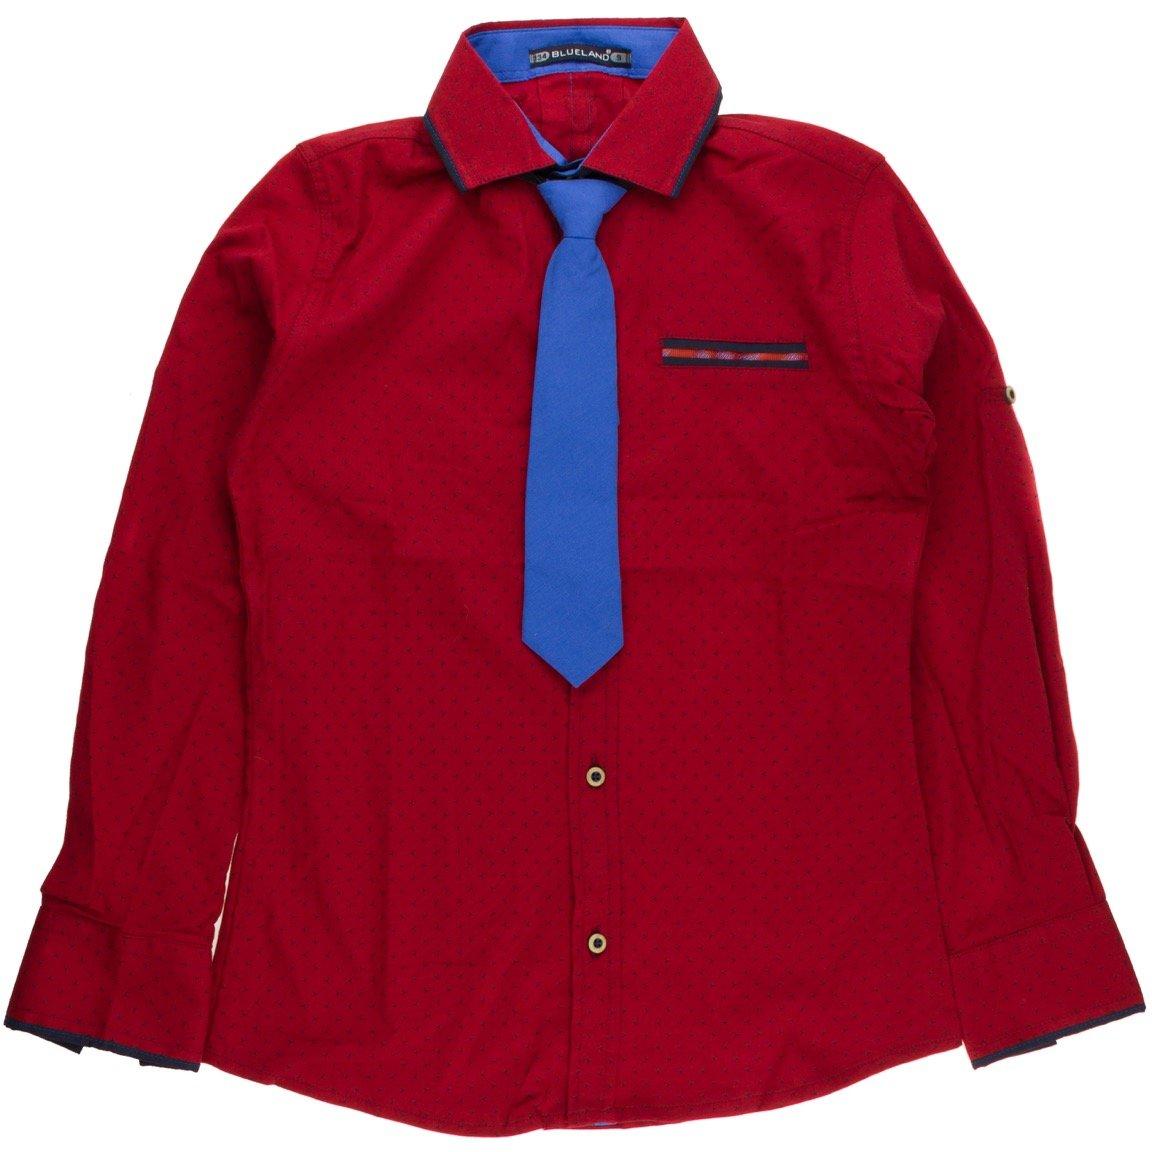 85d4d29baf6 Blue Land παιδικό πουκάμισο και γραβάτα